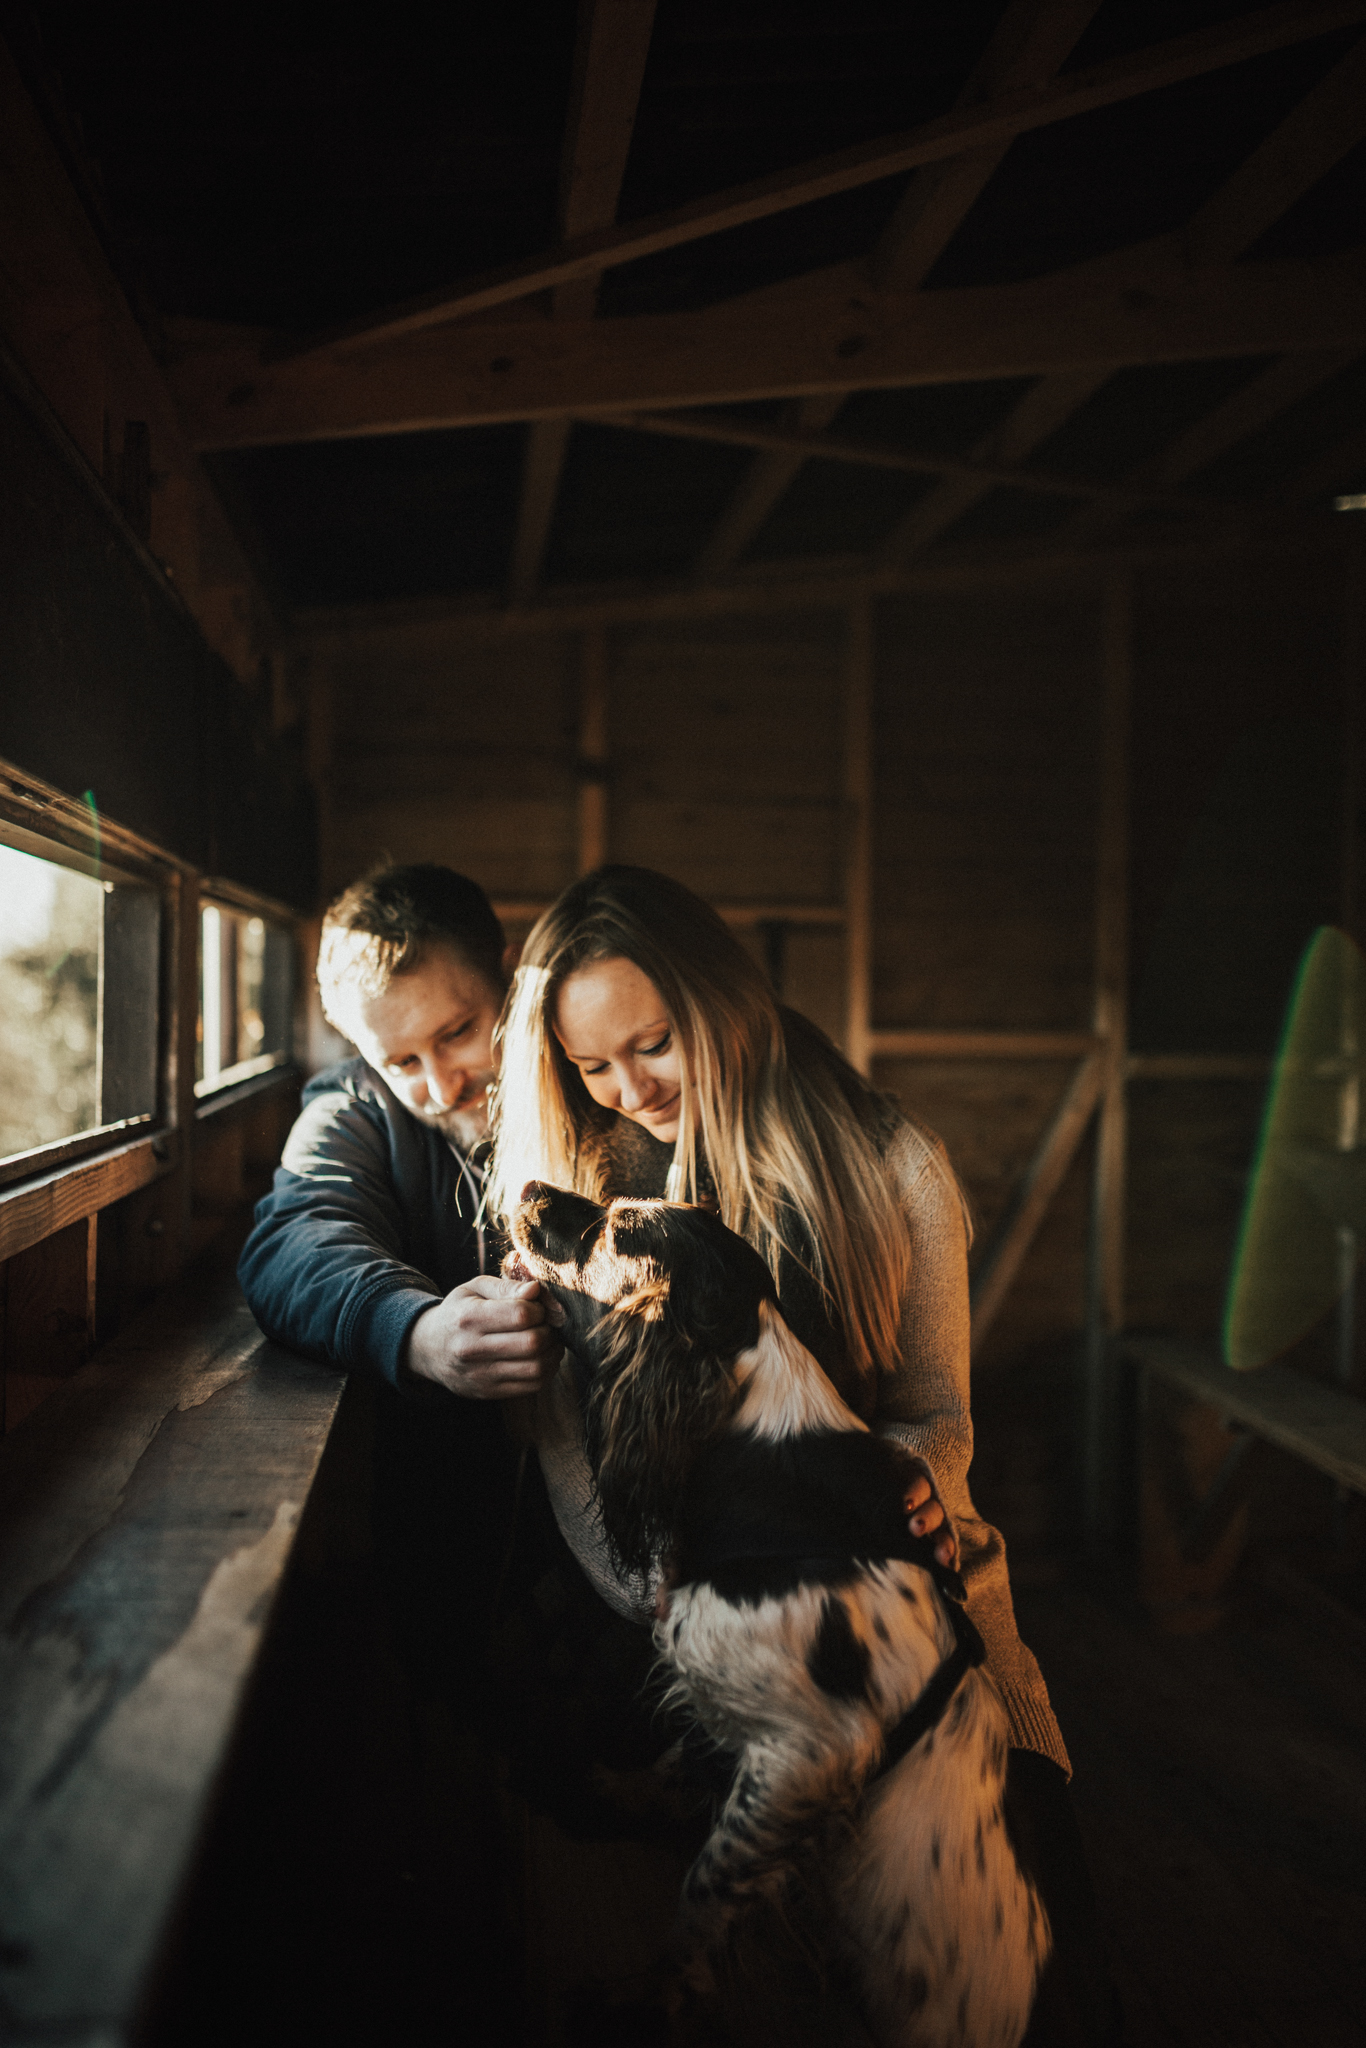 Luke-Mary-Engagement-Adventure-Session-Norfolk-Photography-Photographer-Darina-Stoda-4.jpg